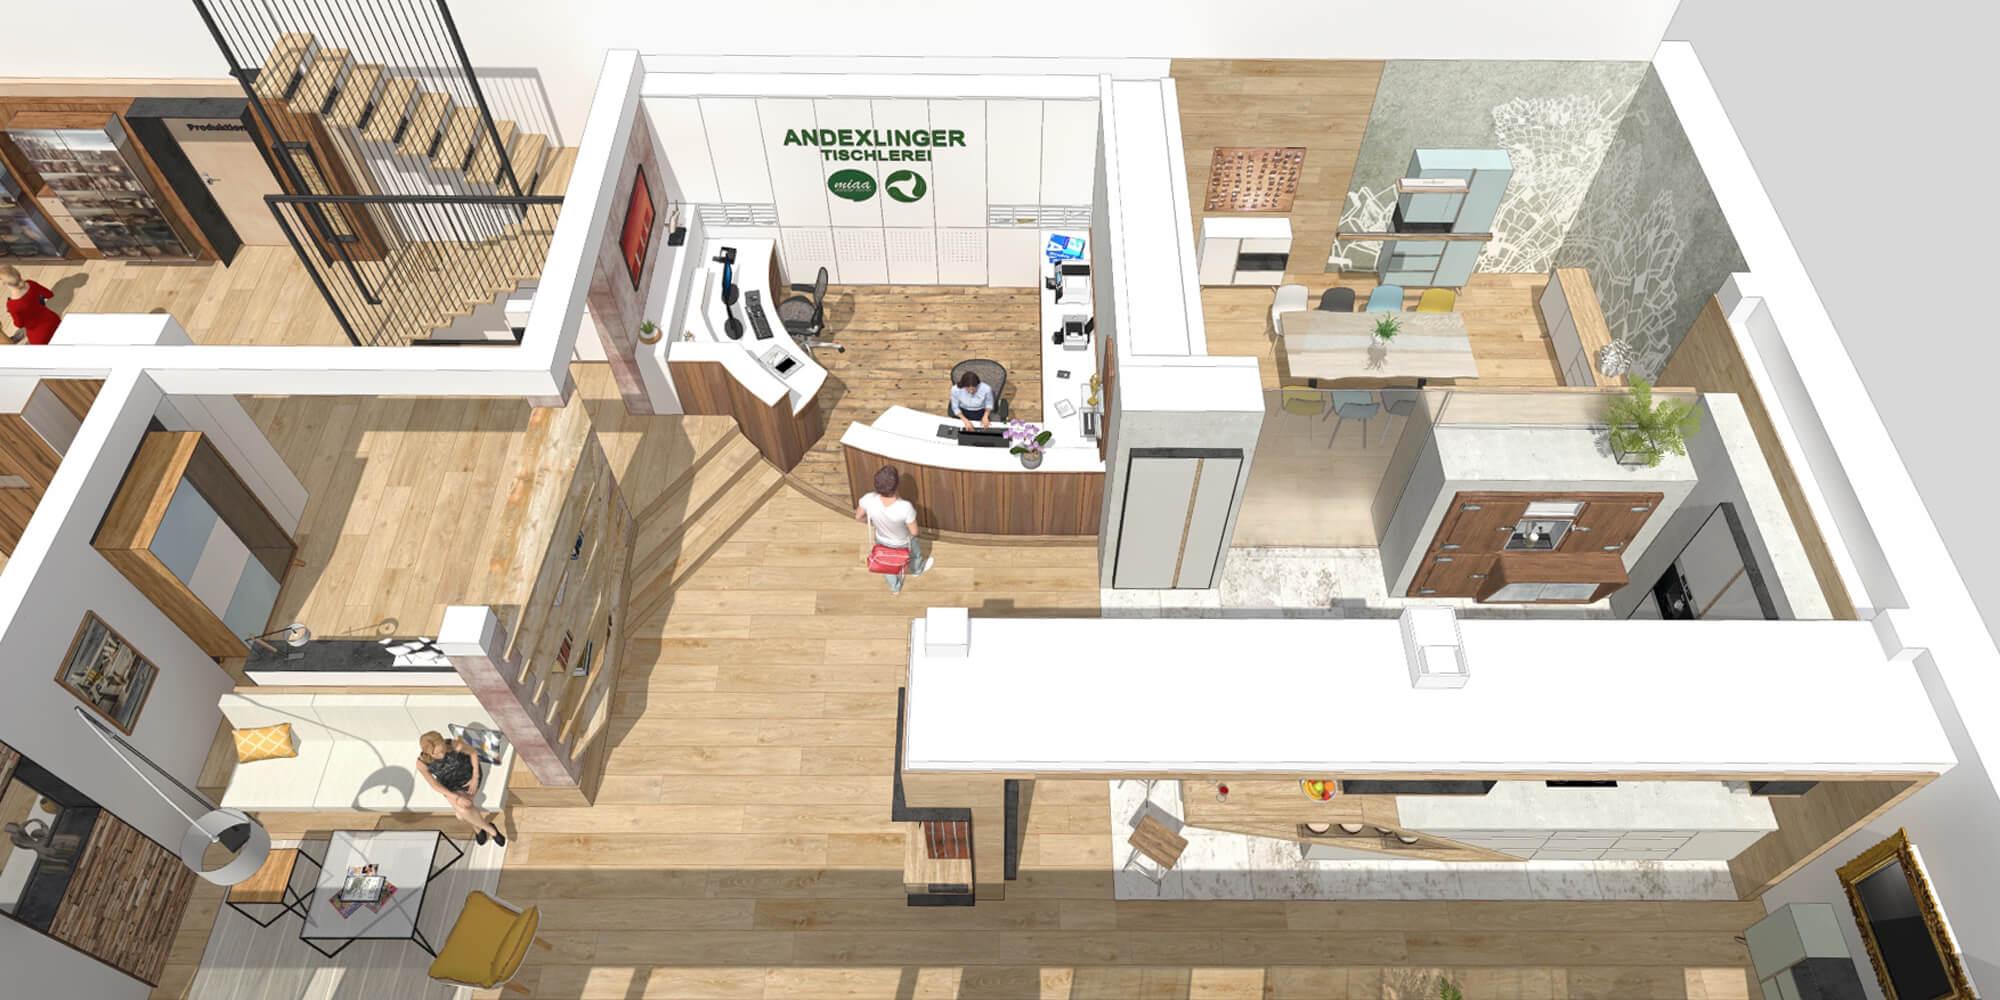 Cre-Plan-Design-Architektur-Innenarchitektur-Design-Referenz-Andexlinger-01